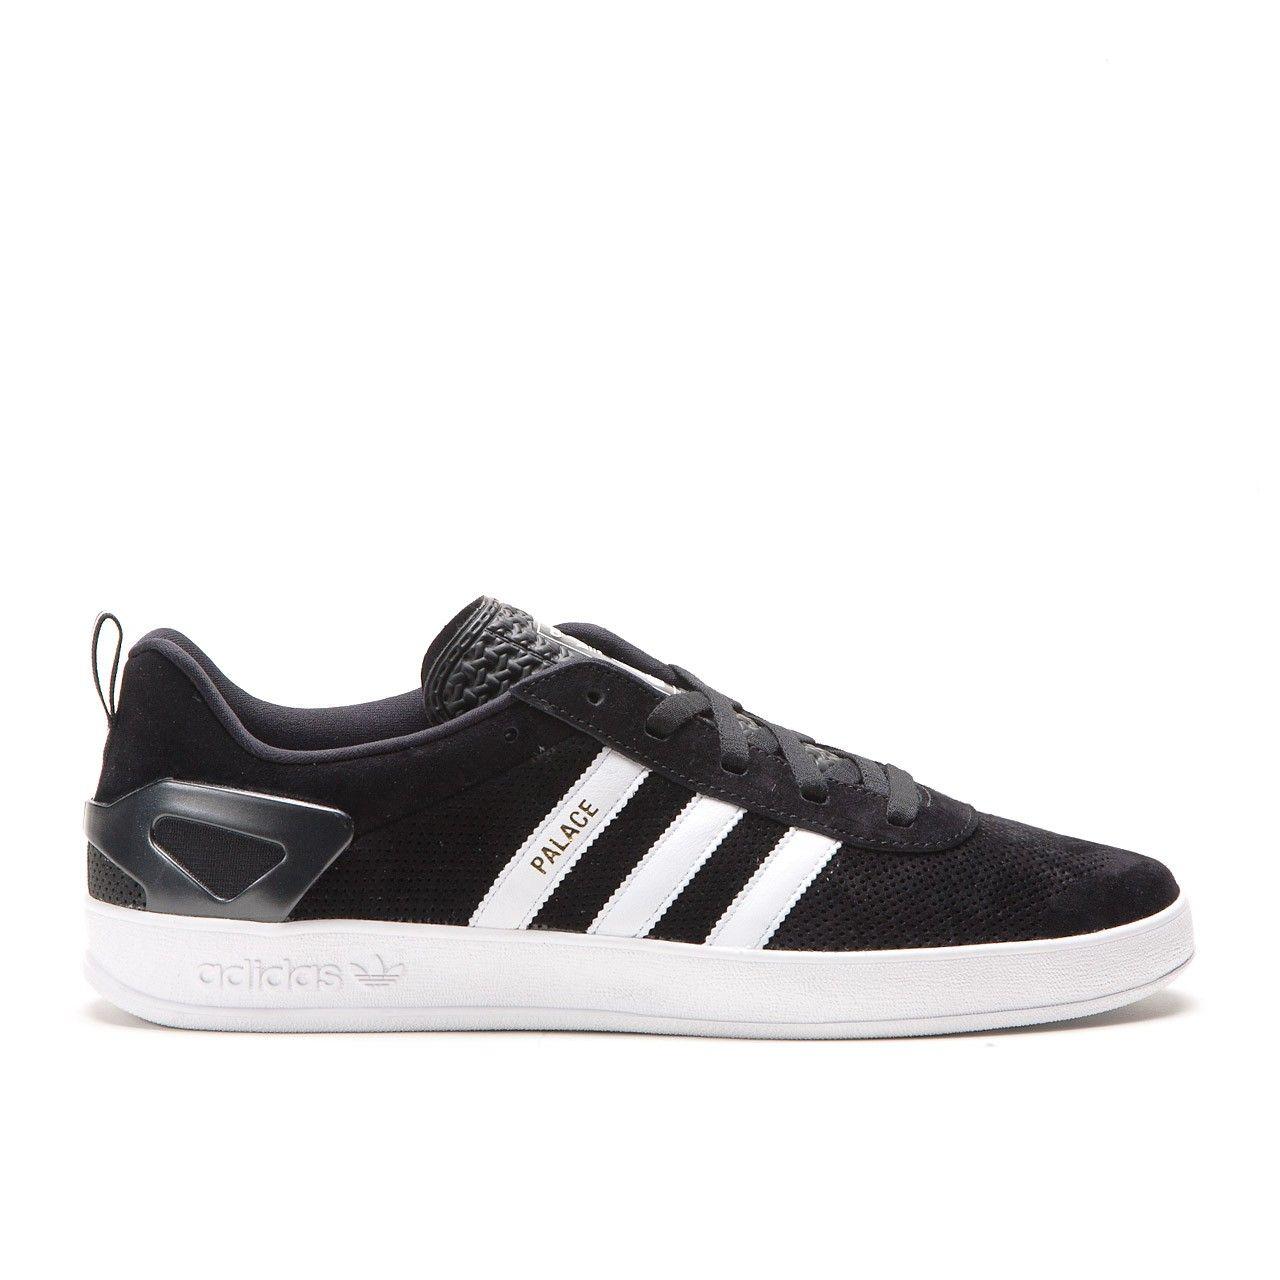 Skate shoes jakarta - Adidas X Palace Pro Core Black Running White